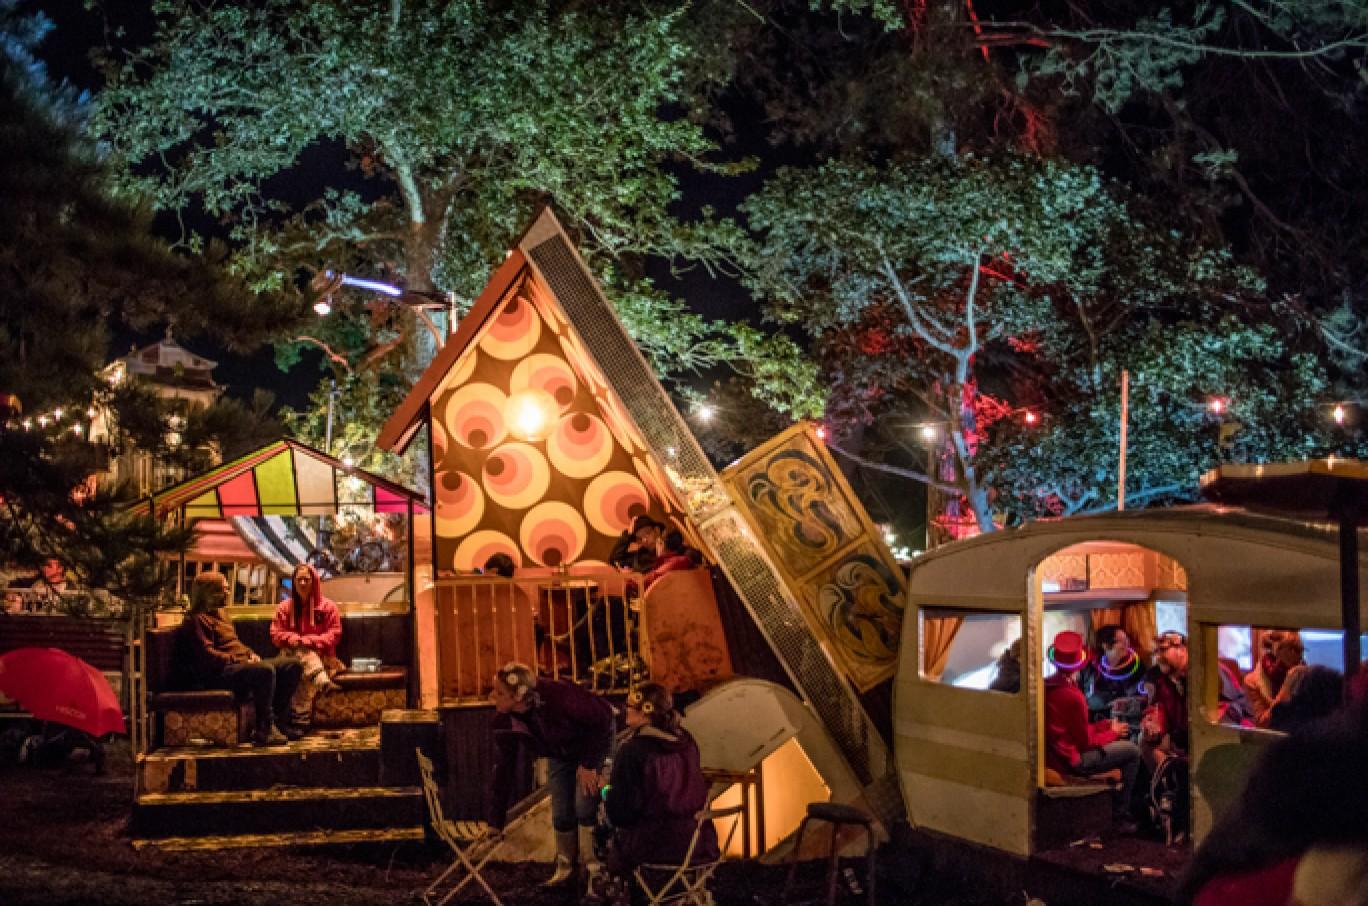 6_42-camp-bestival-2017-disney-rascal-cl-vic_80111501585010